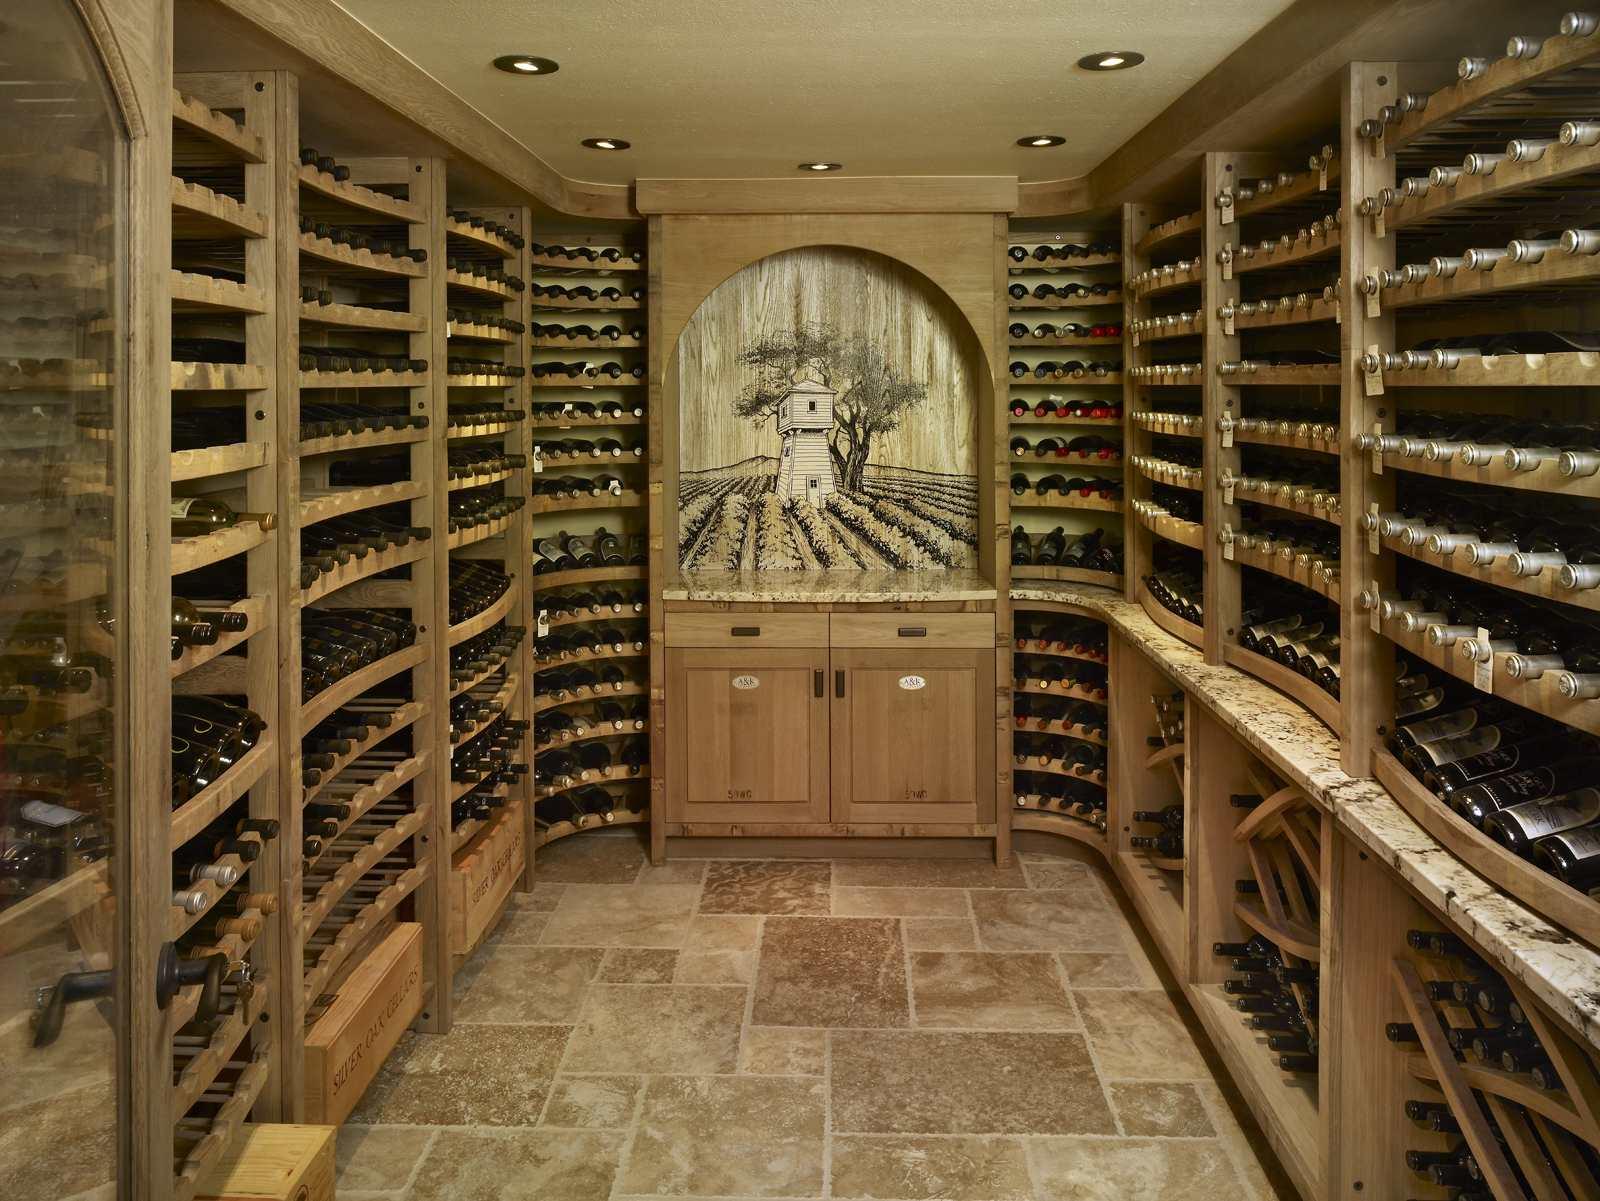 Recycled Wine Barrels - Eclectic - Wine Cellar - Orange ...   Barrel Wine Cellar